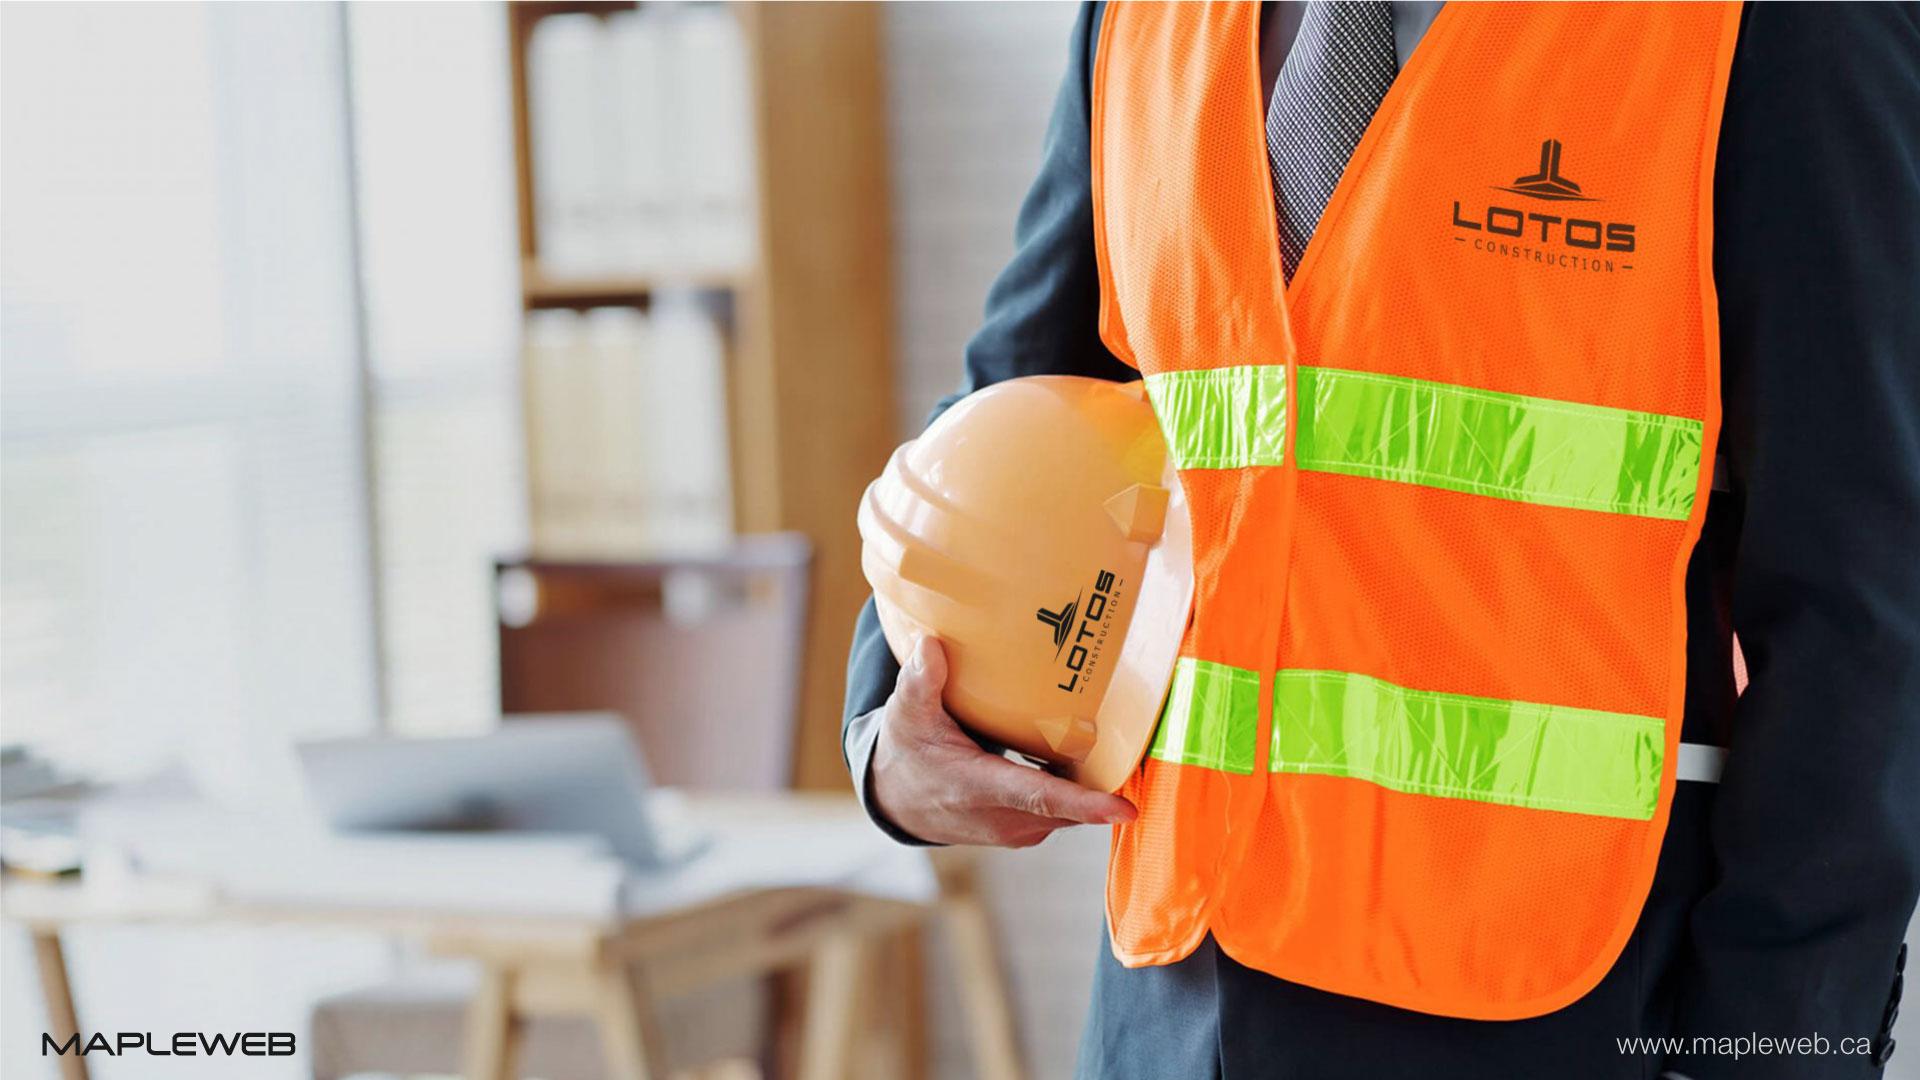 lotos-construction-brand-logo-design-by-mapleweb-vancouver-canada-3d-silver-mock